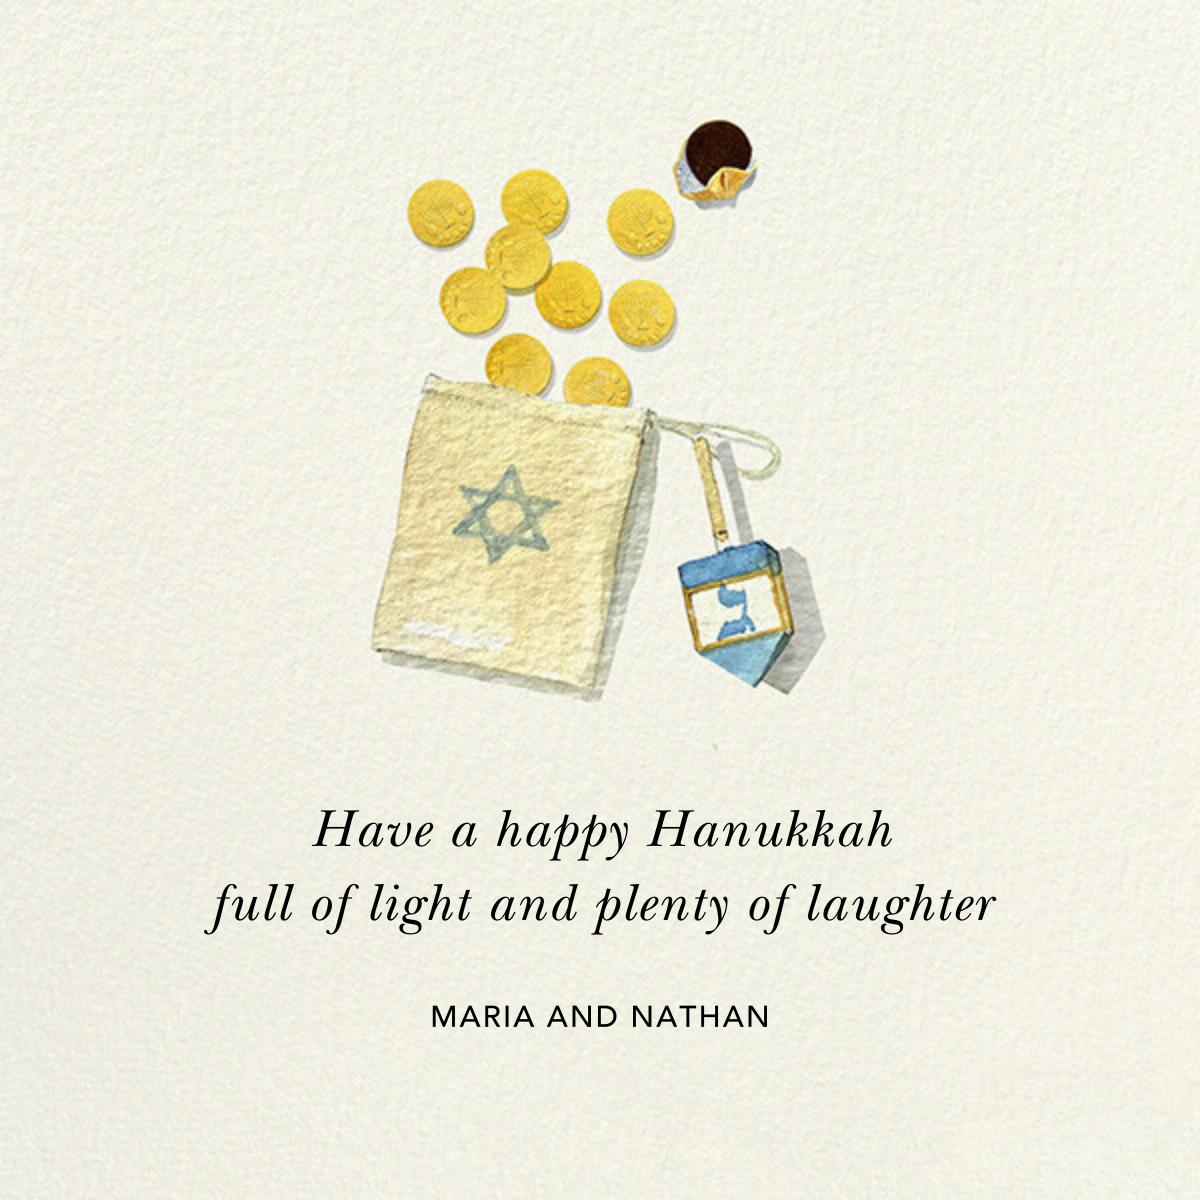 Light and Laughter - Felix Doolittle - Hanukkah